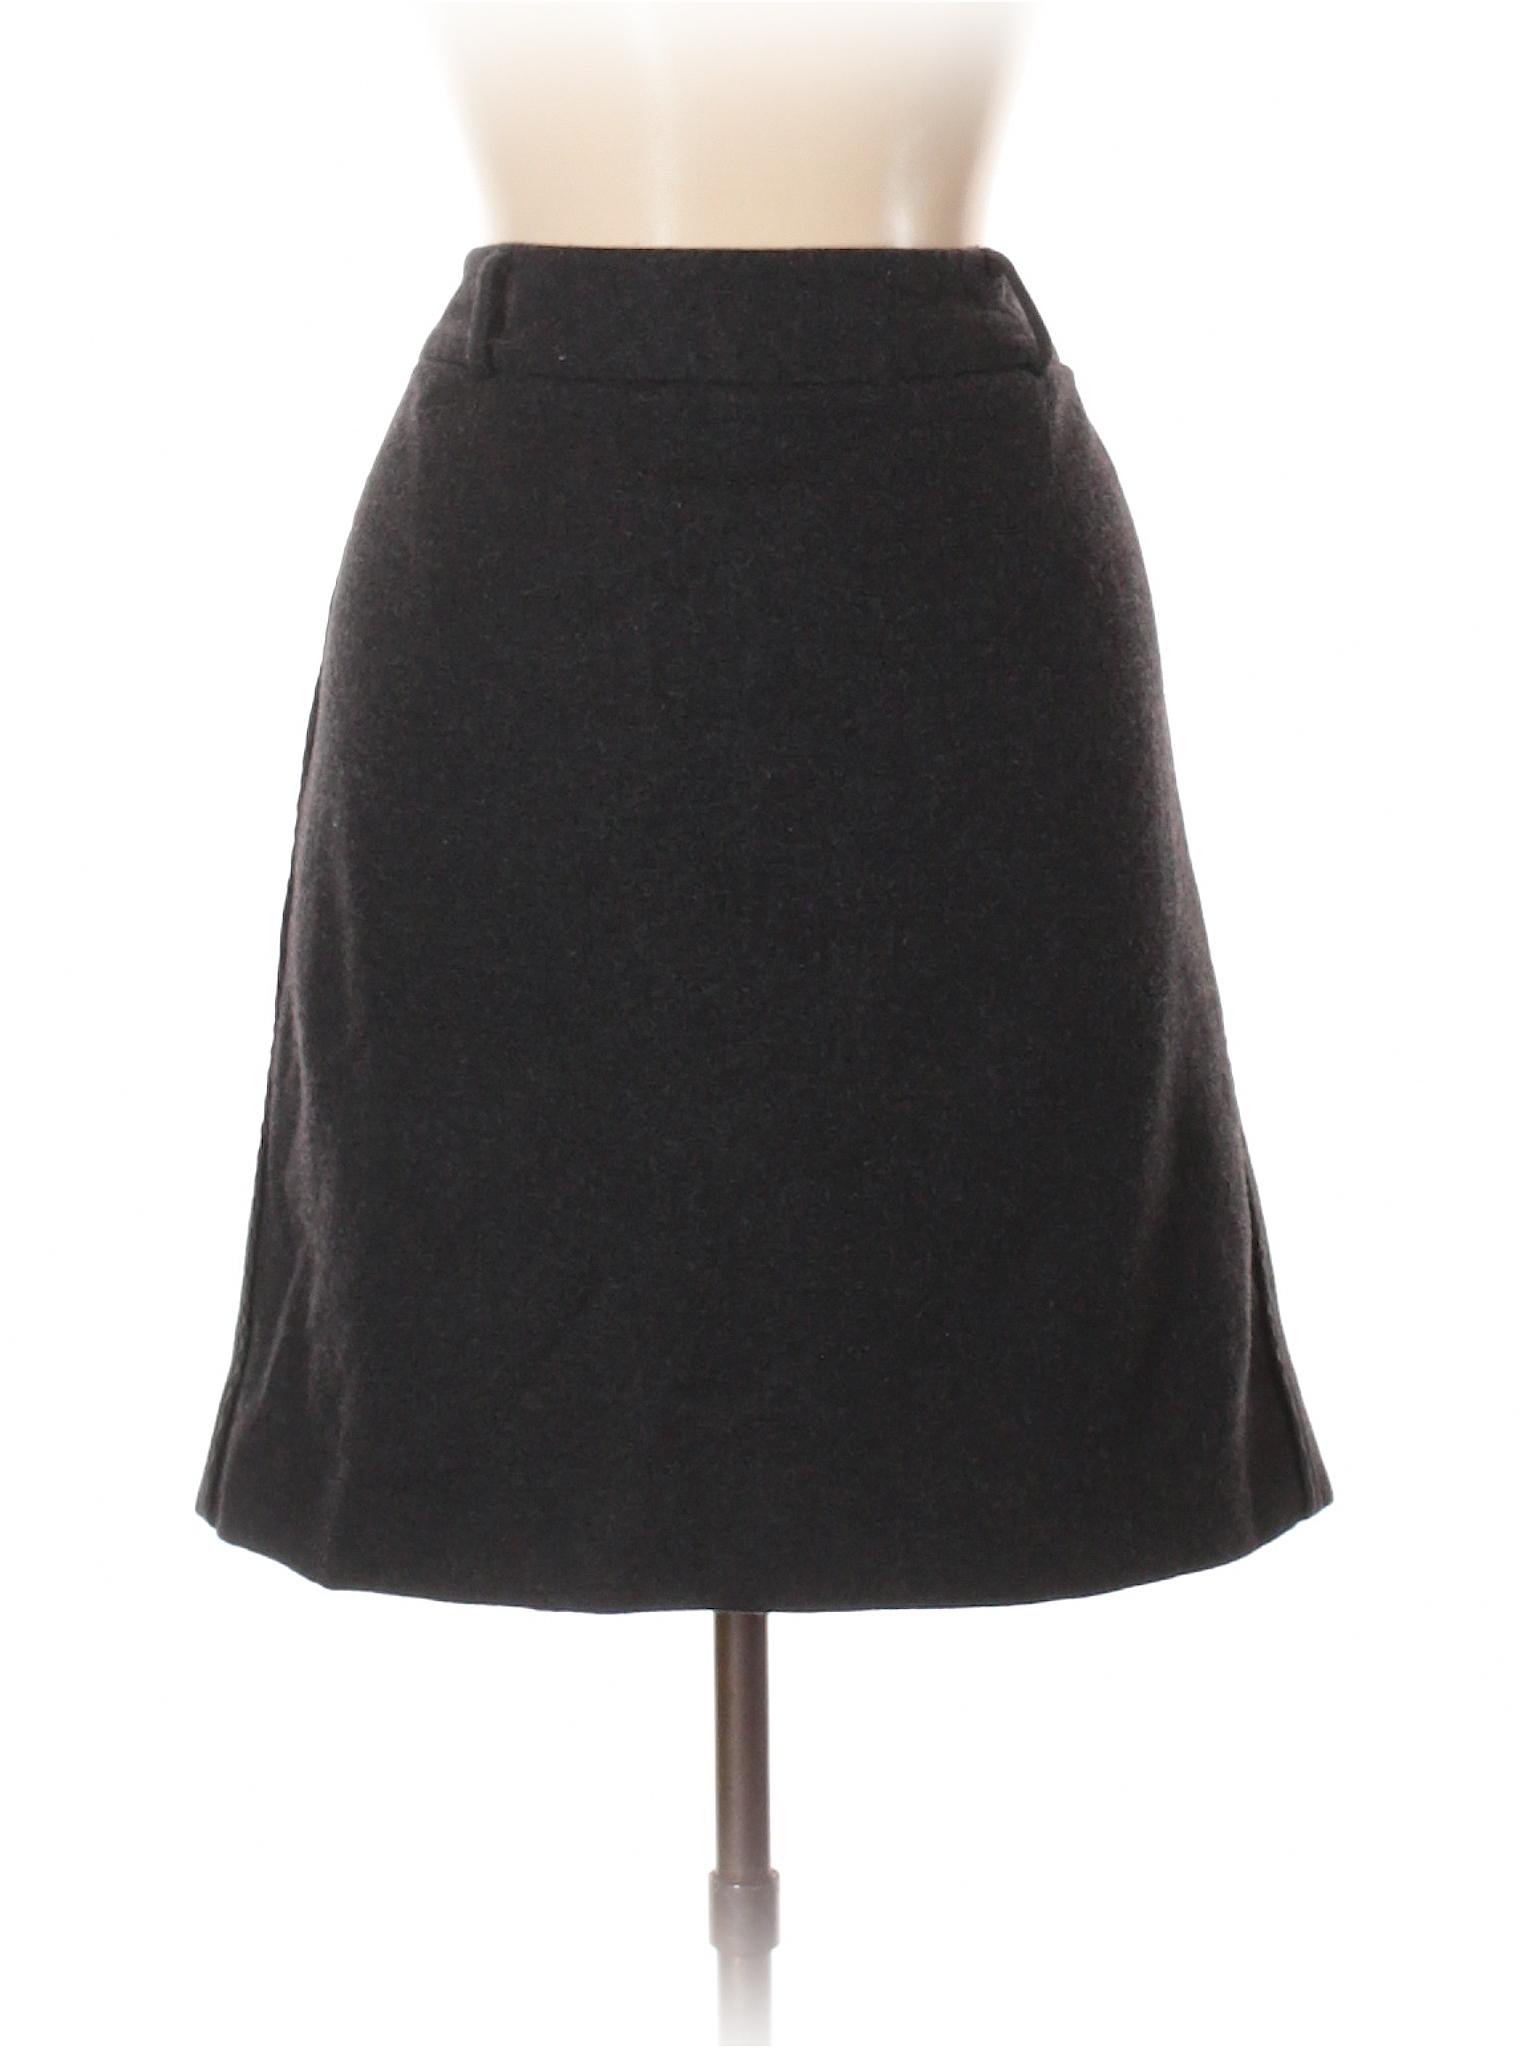 leisure Company Wool amp; Skirt Nine Boutique wZq8fdzw